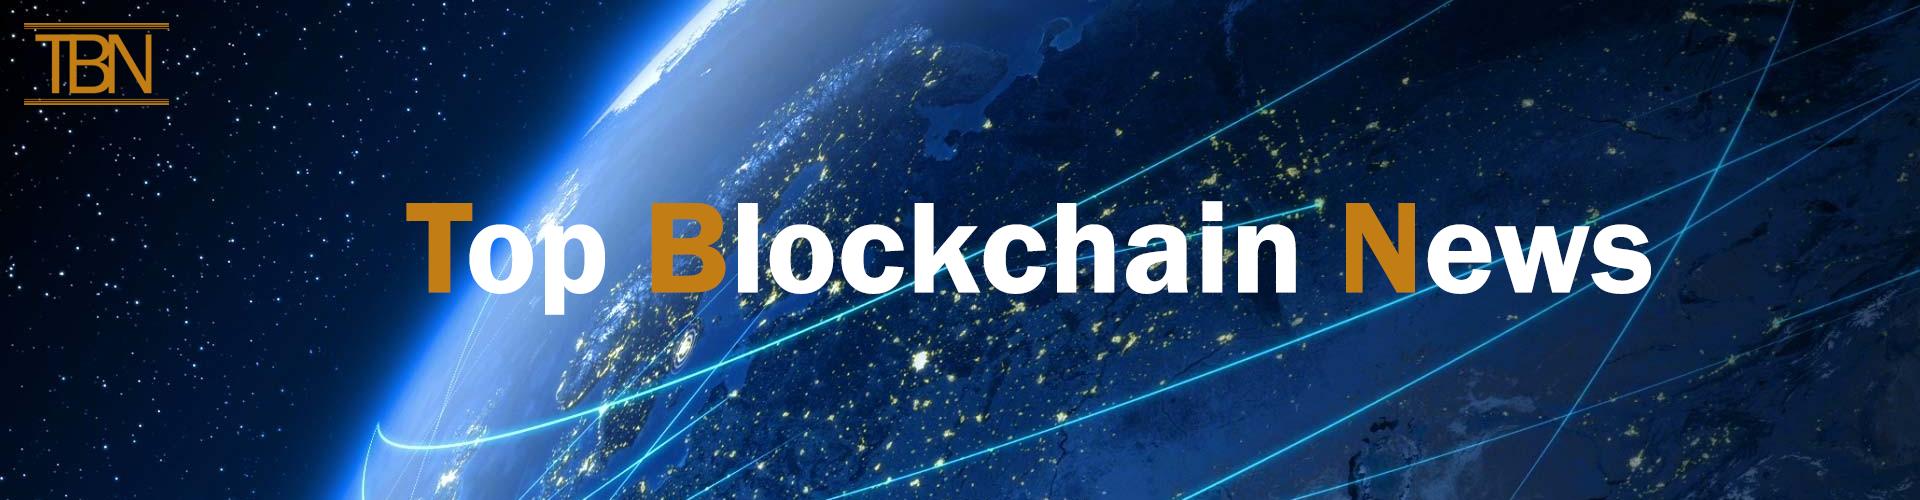 Top Blockchain News